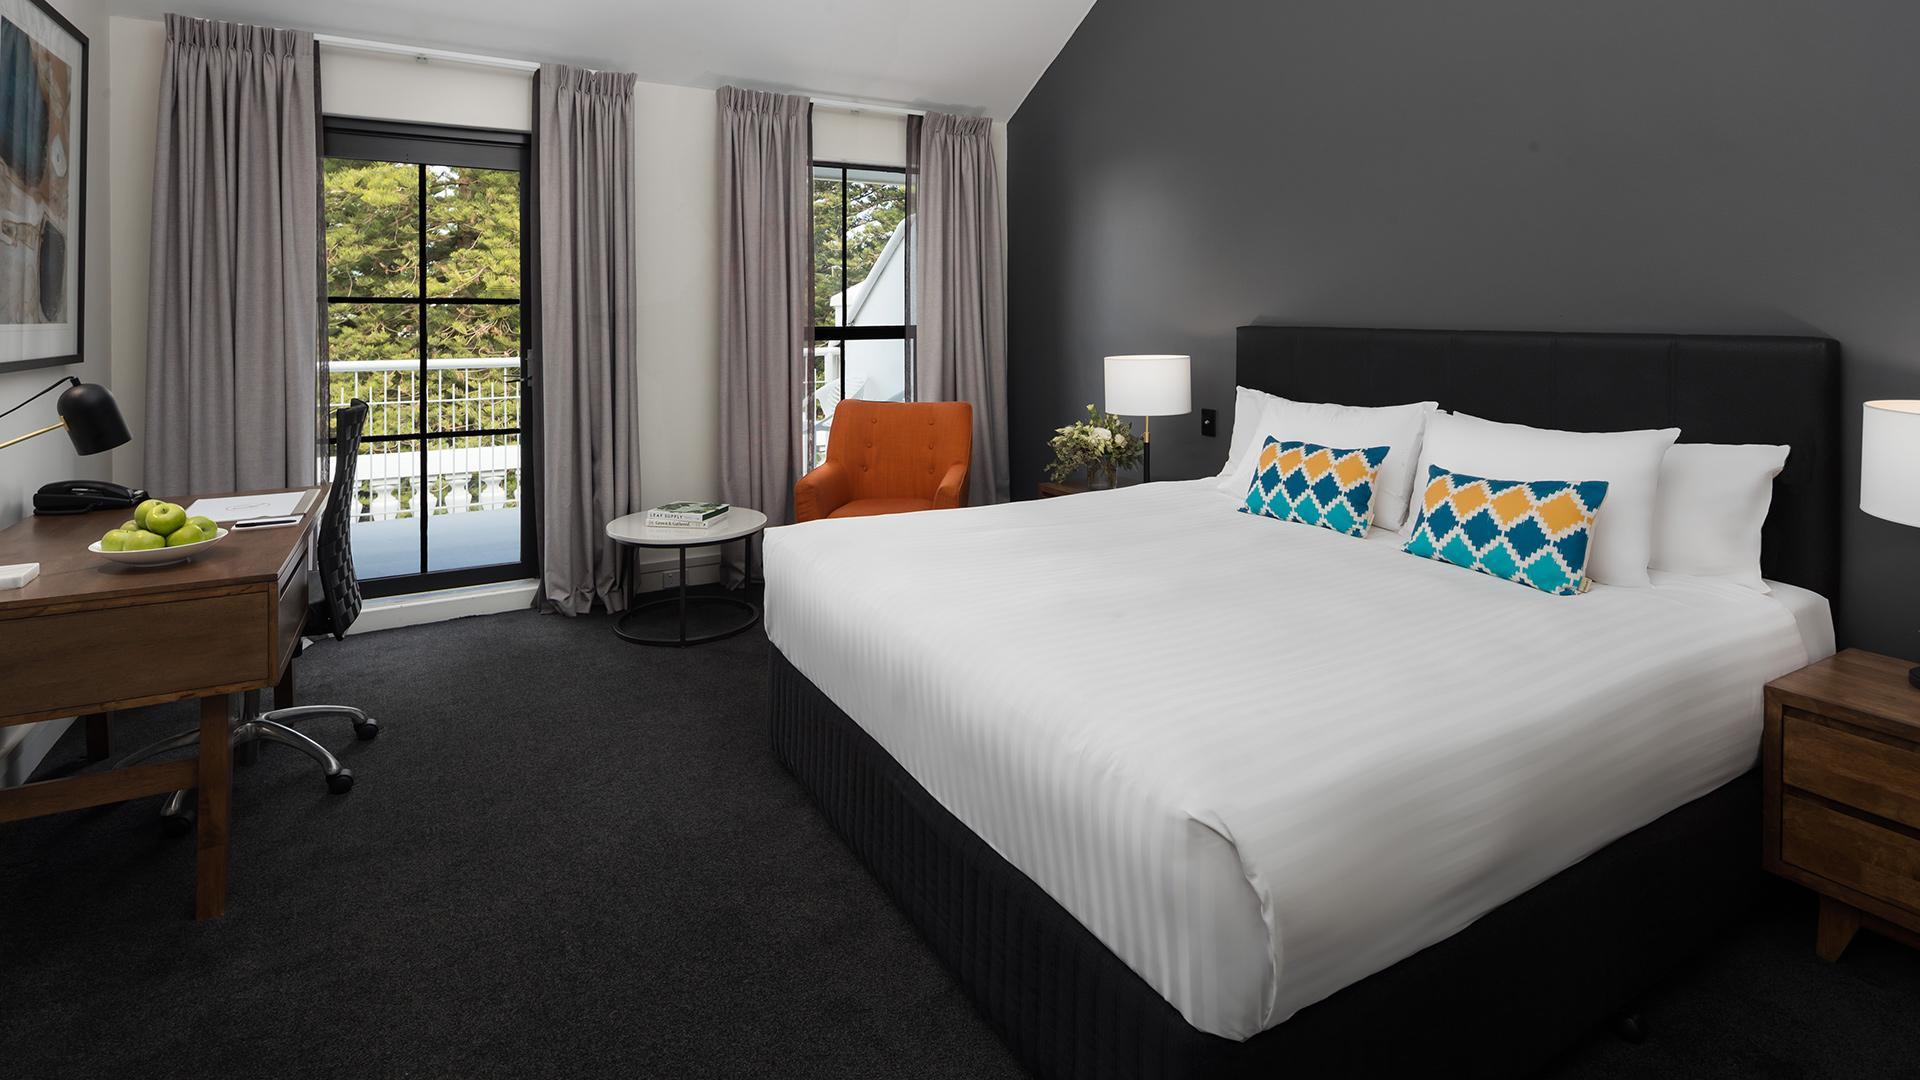 King Spa Room - Rottnest Ferry Upgrade image 1 at Esplanade Hotel Fremantle by Rydges  by City of Fremantle, Western Australia, Australia